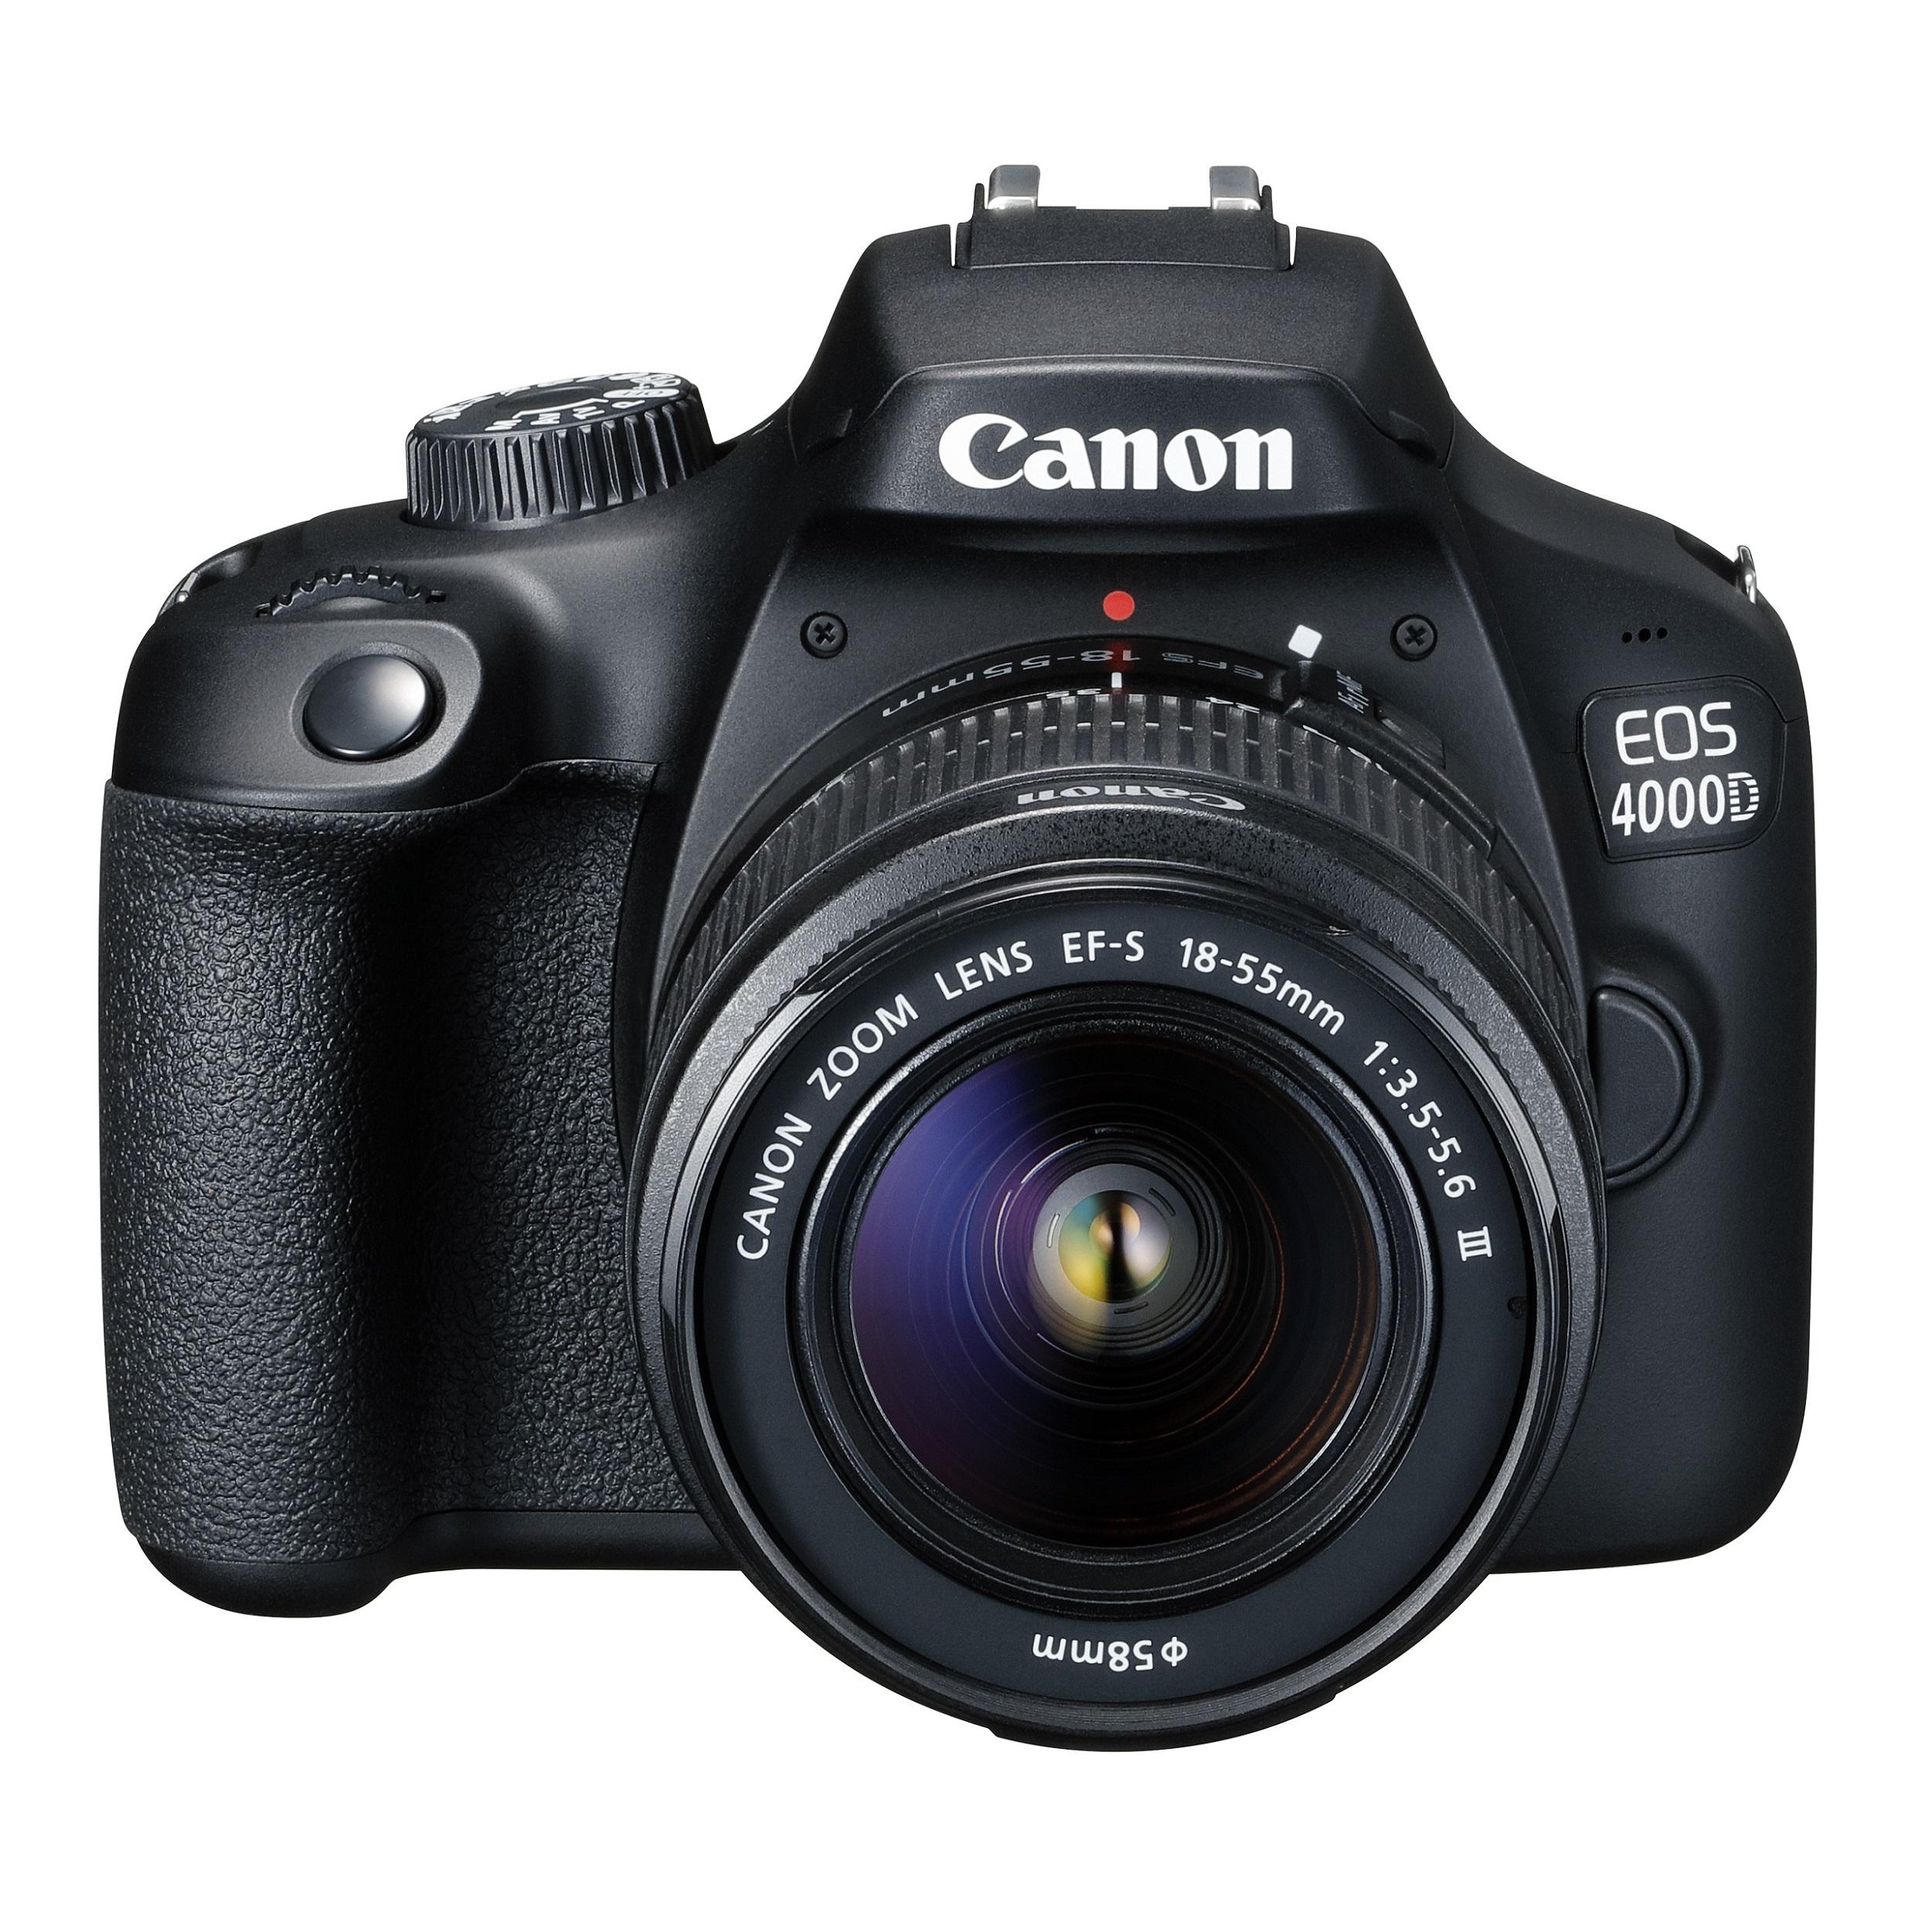 دوربین دیجیتال کانن مدل EOS 4000D به همراه لنز 18-55 میلی متر DC III و لوازم جانبی thumb